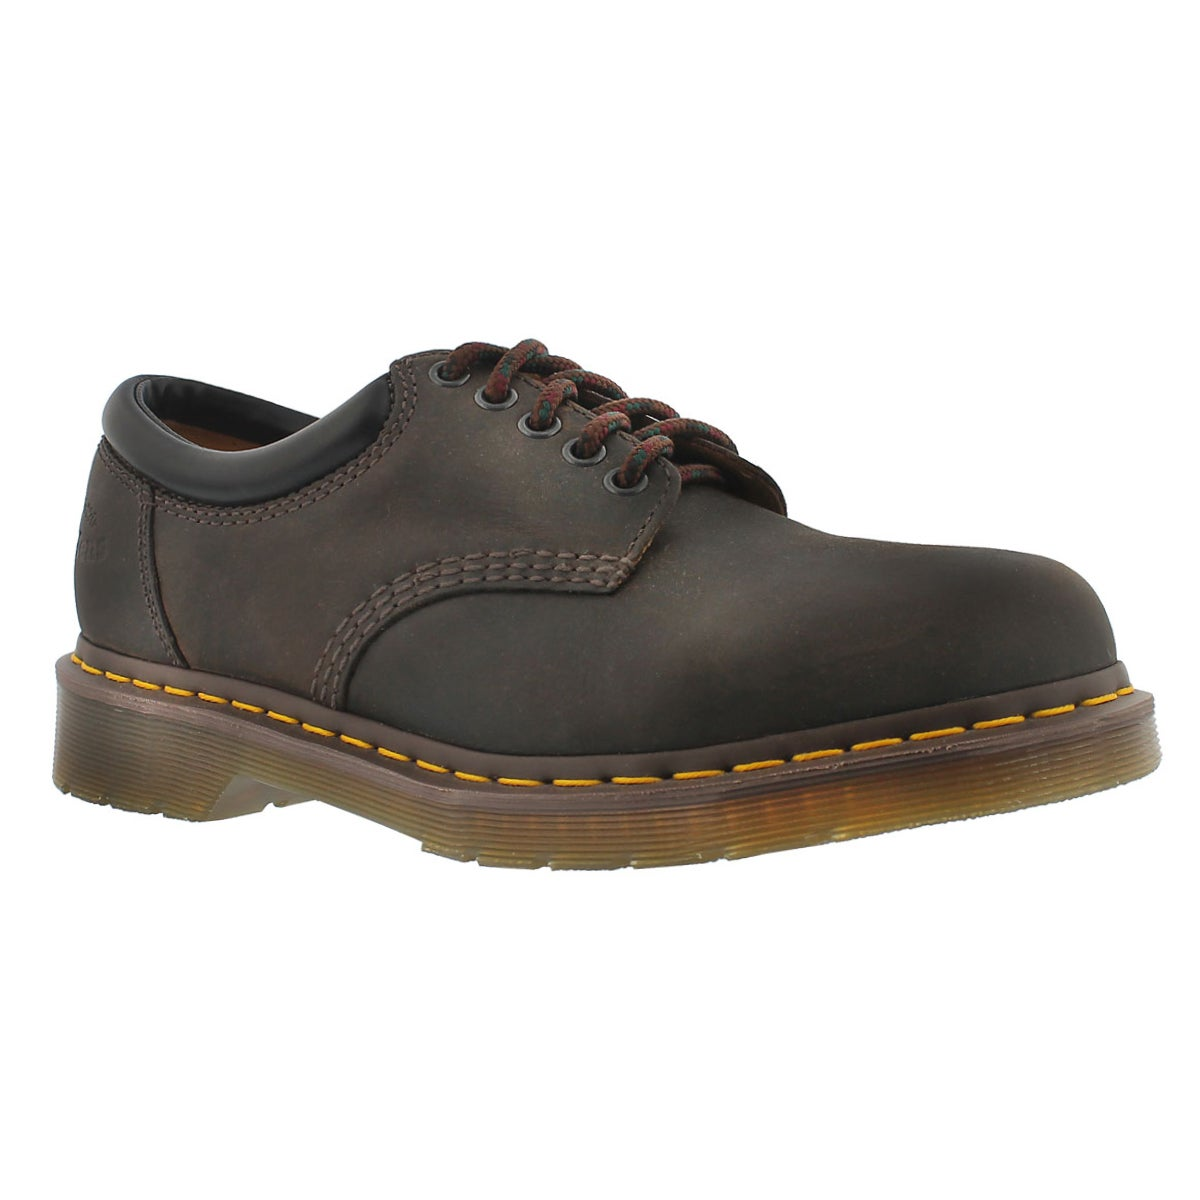 Men's 8053 5-Eye Leather Oxford - Brown Crazyhorse